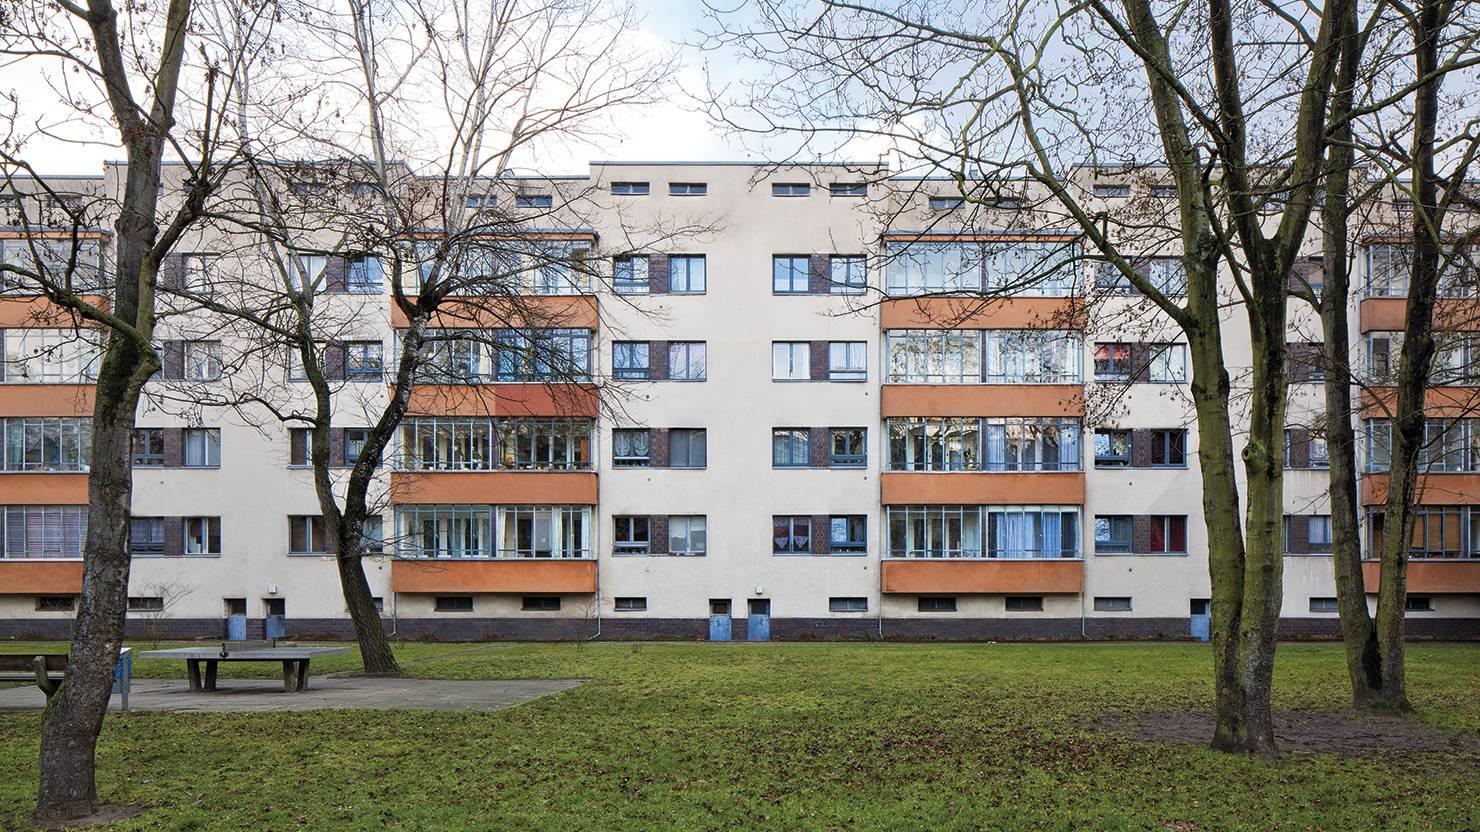 serramenti-acciaio-zincato-siemensstadt-winfried-brenne-3_project_big